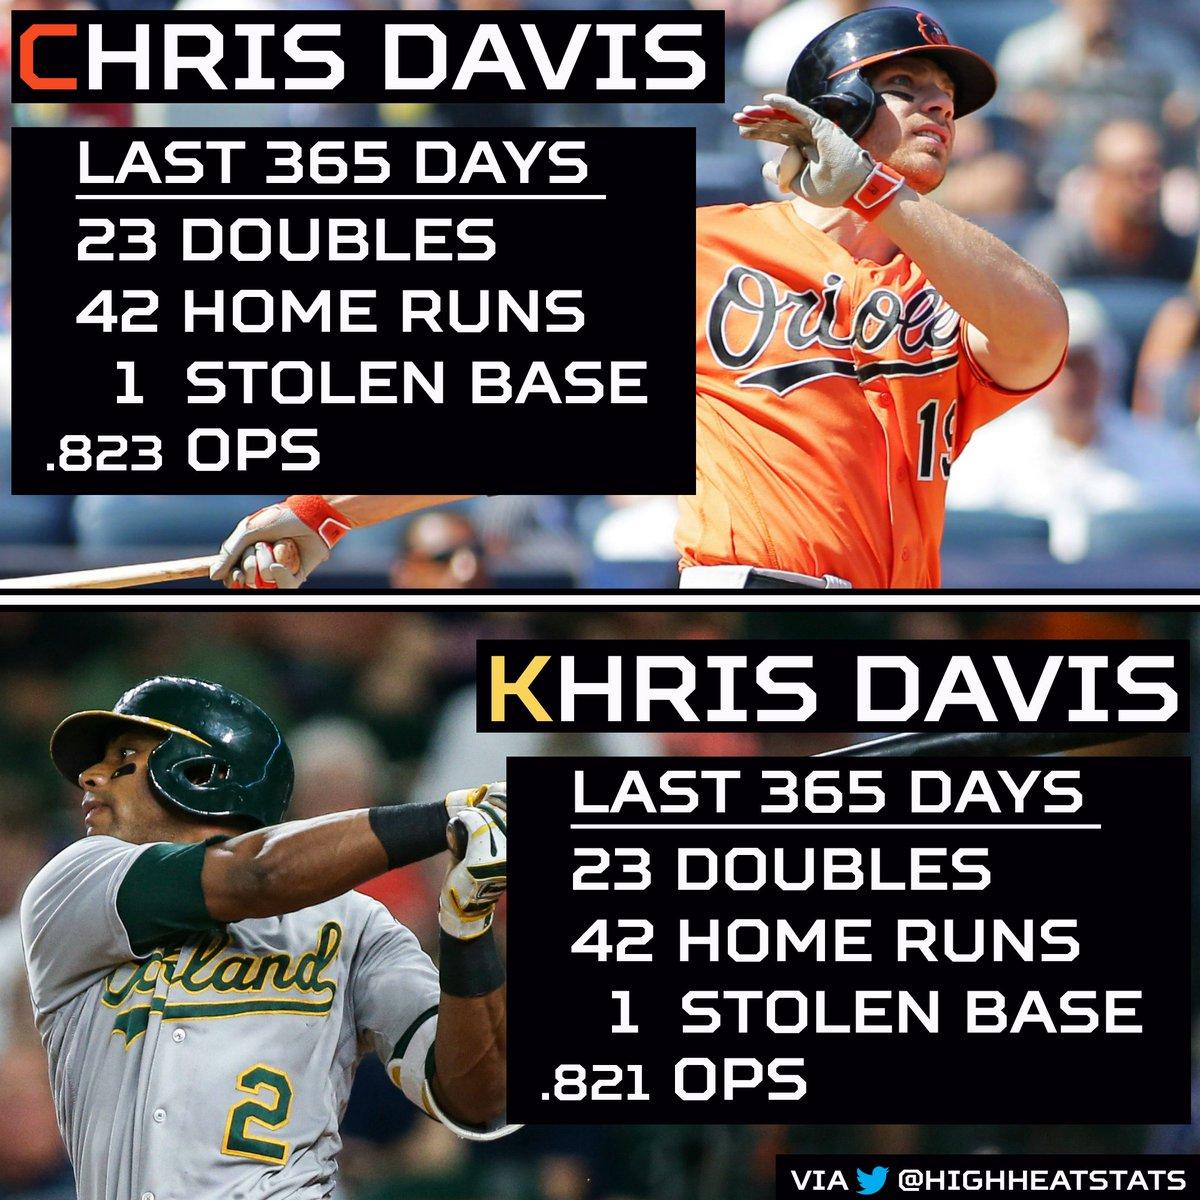 Chris Davis vs Khris Davis